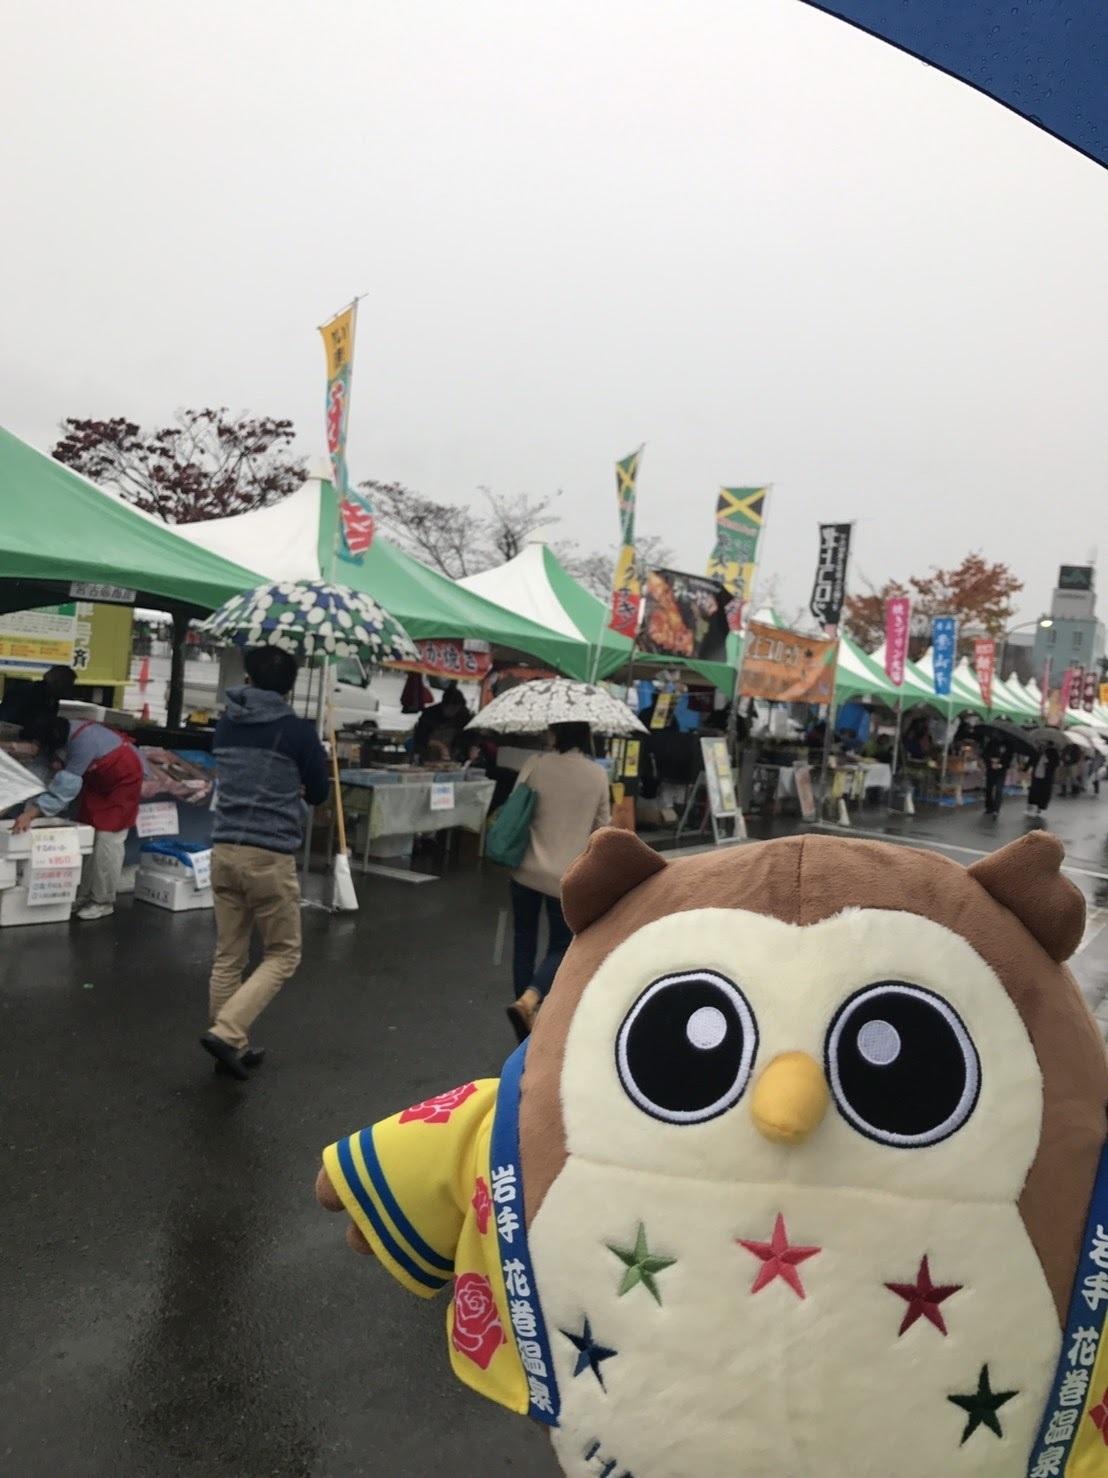 20171022_JAいわて花巻 農業まつり�A.jpg